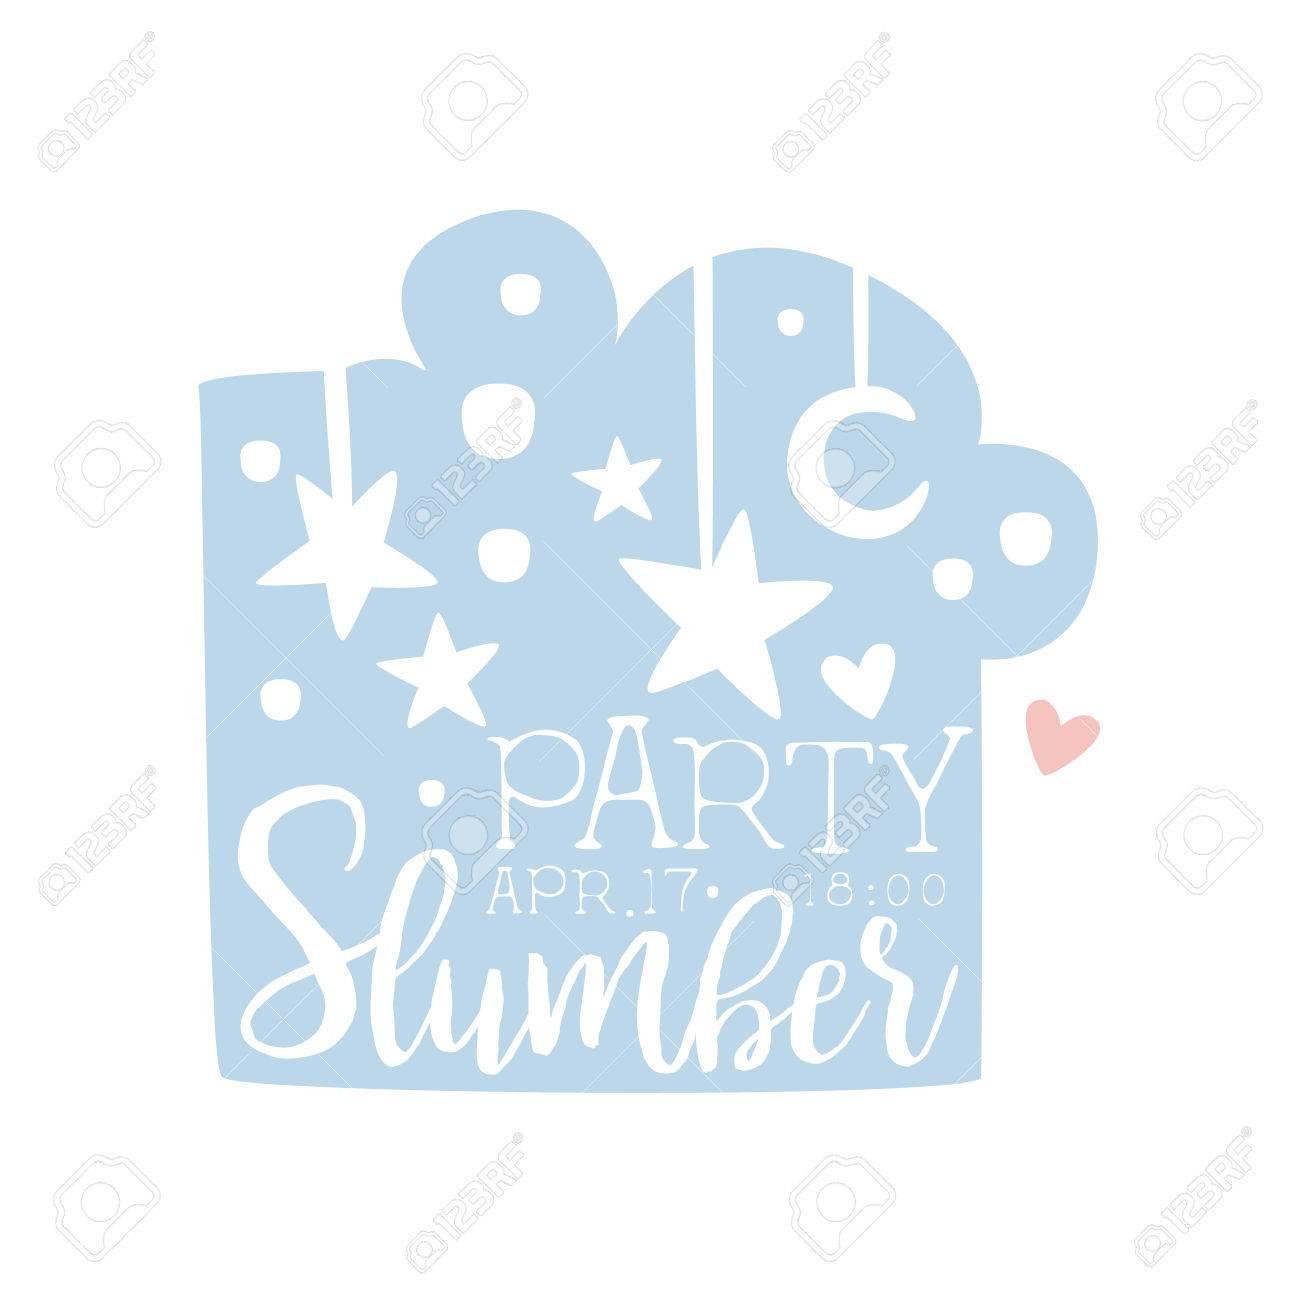 girly pajama party invitation card template with night sky inviting